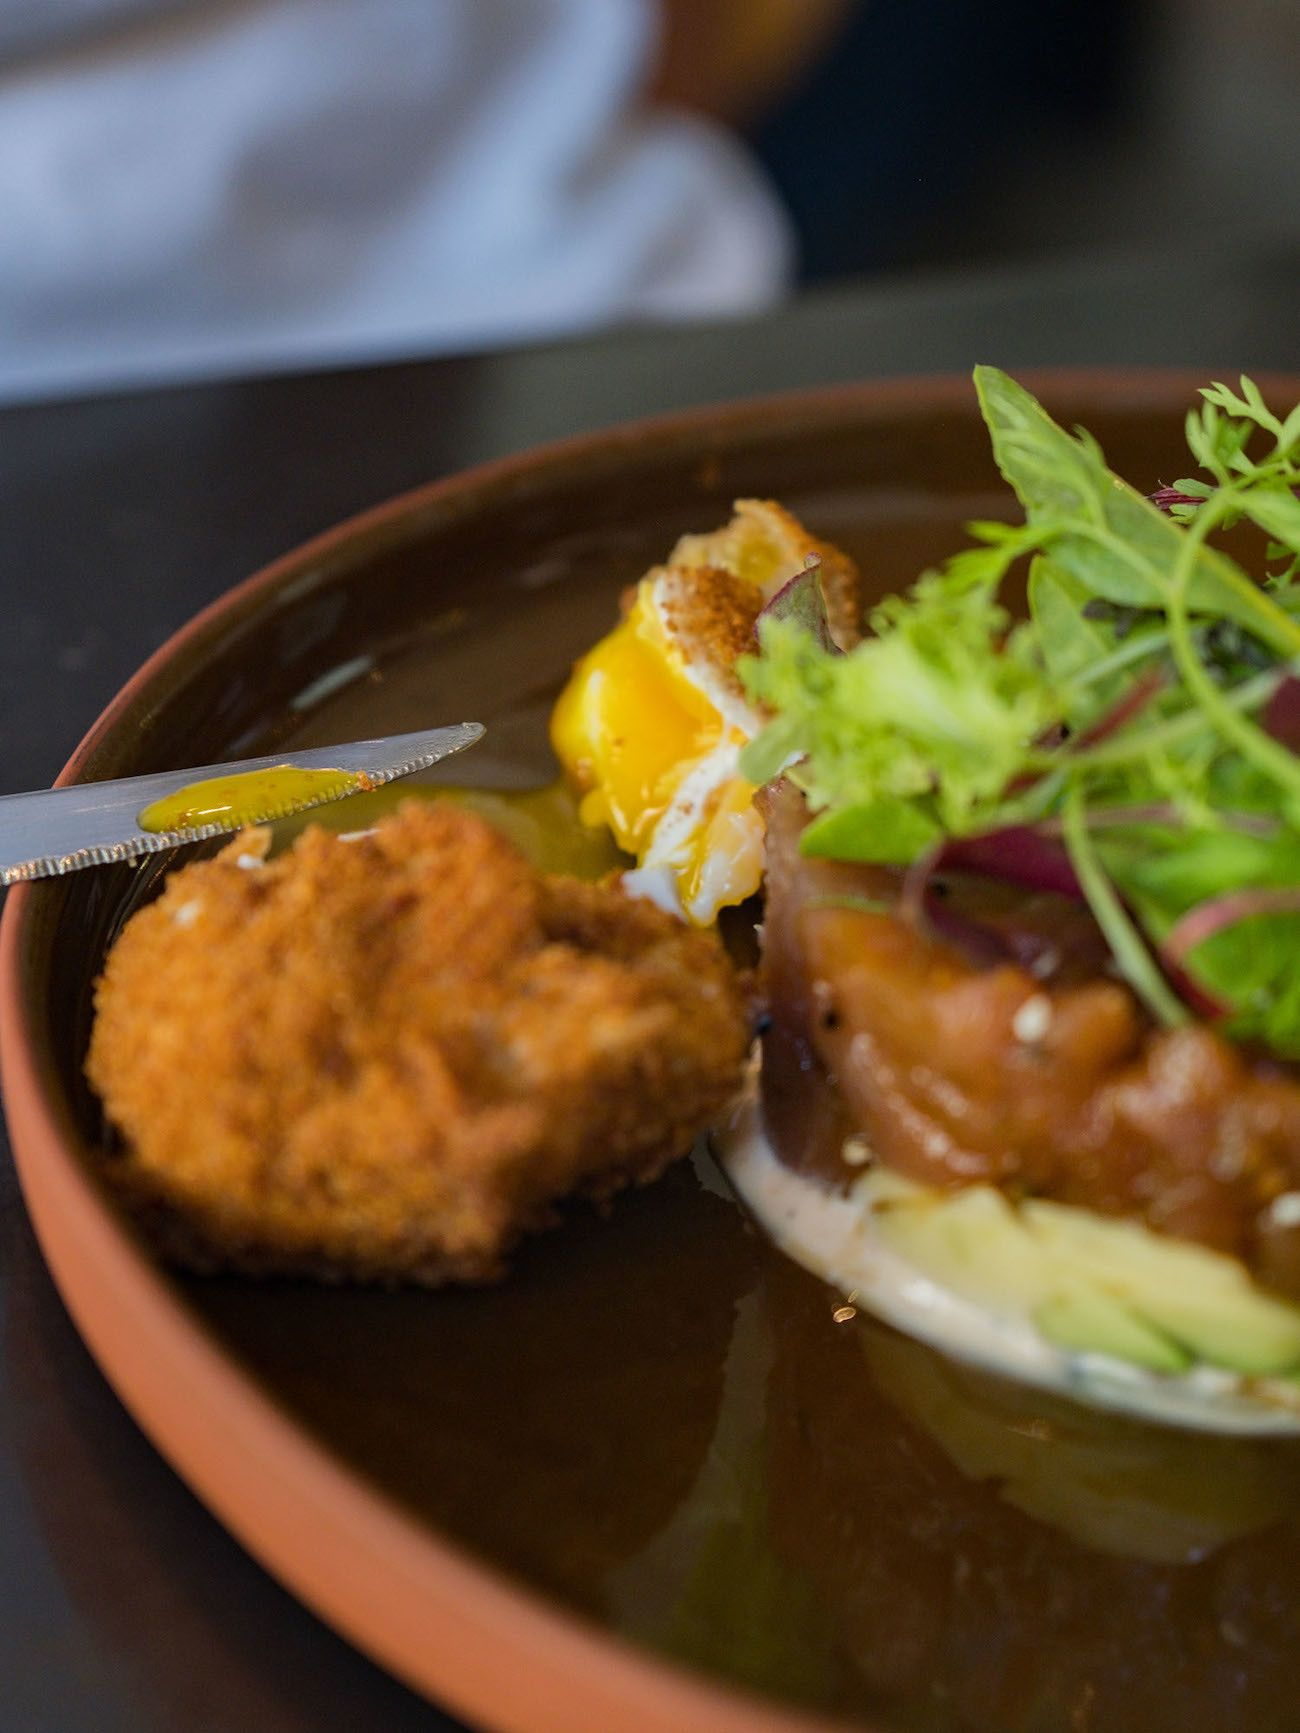 Frühstücks - und Brunch Guide für Kapstadt, Loading Bay, panko fried egg, avocado,